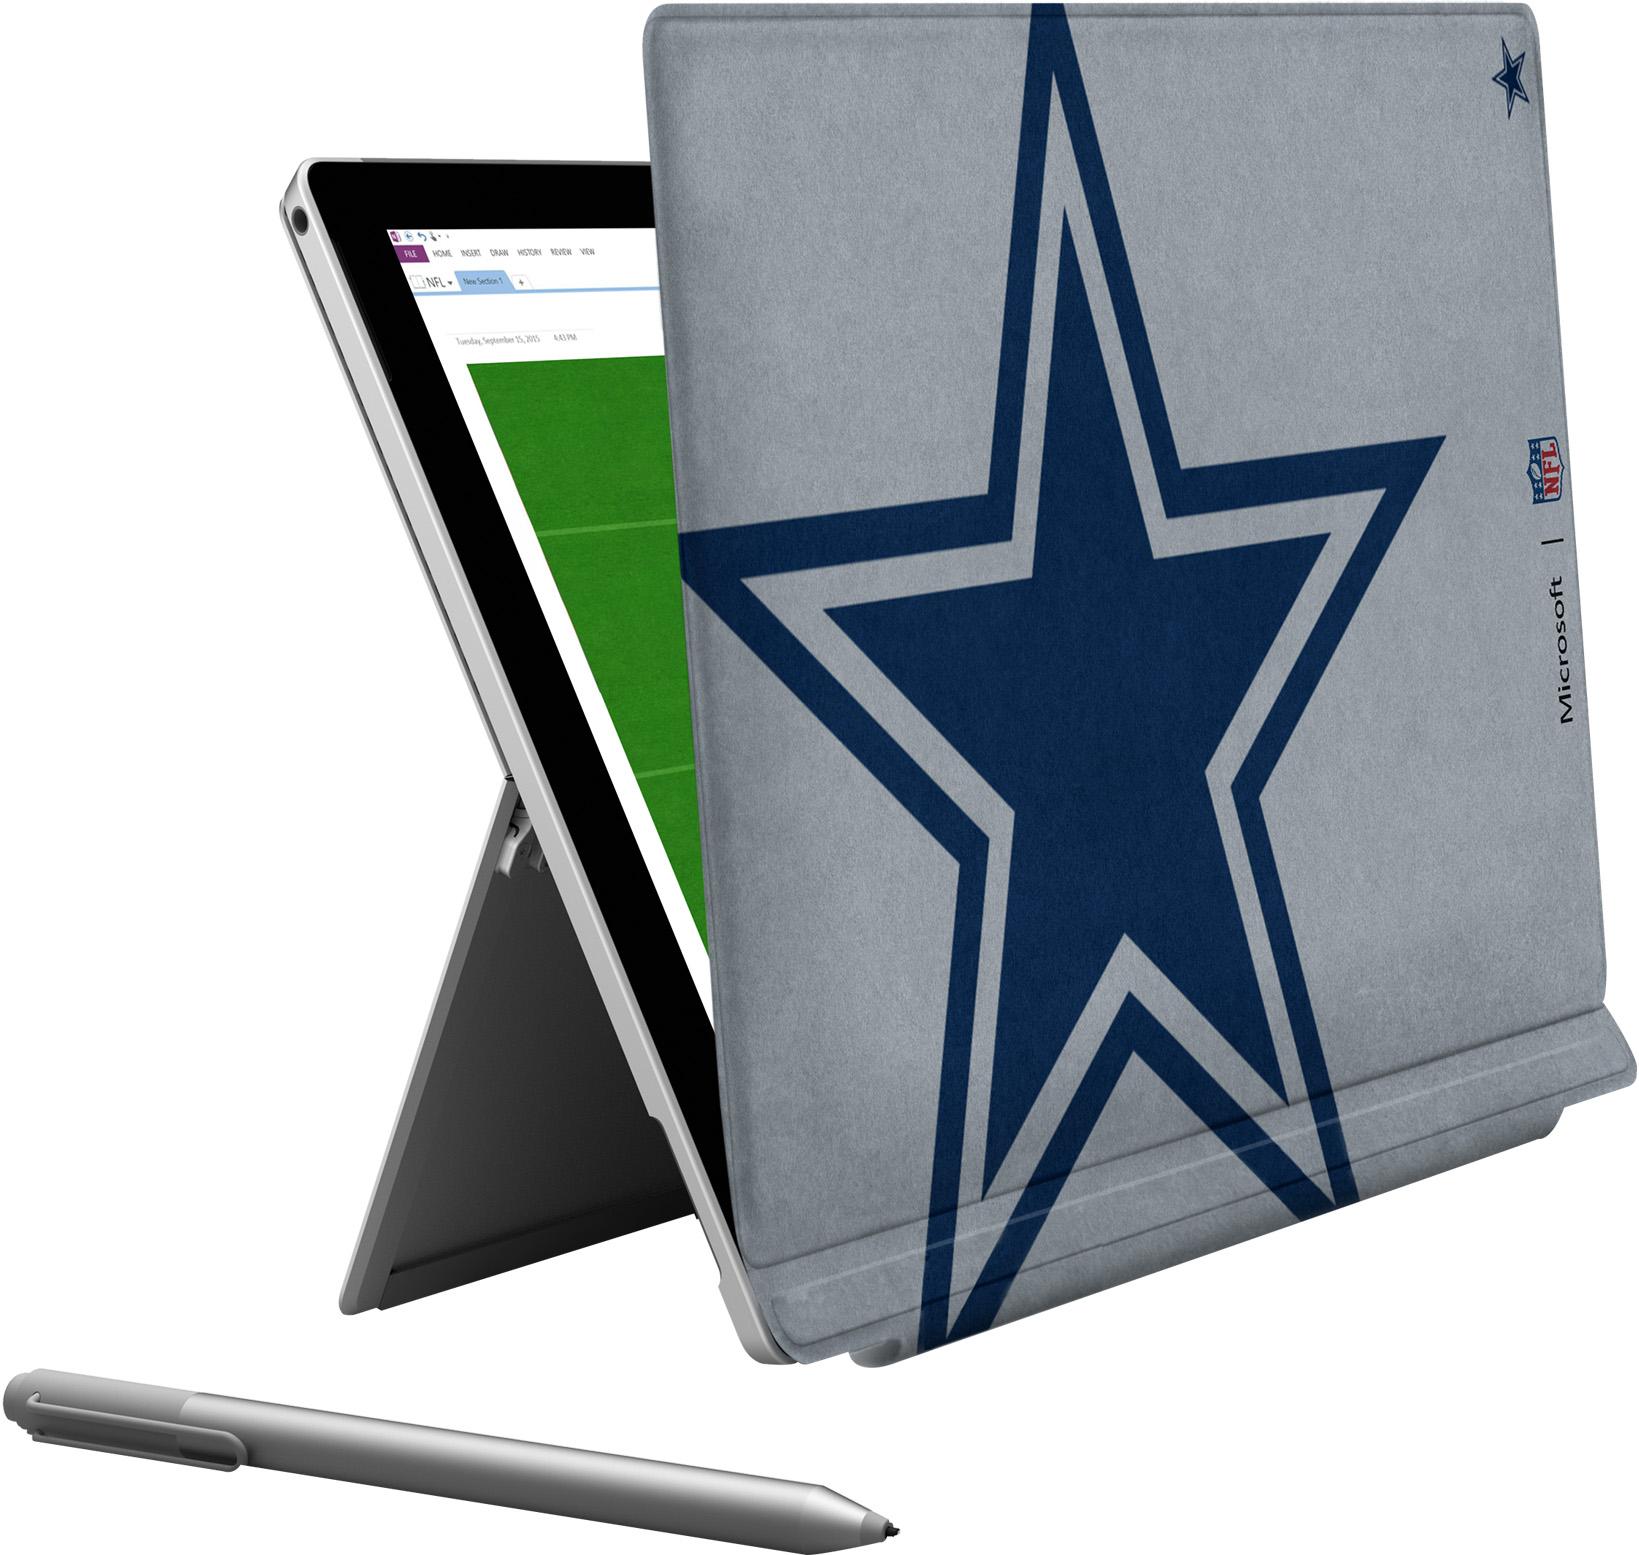 Microsoft Surface Pro 4 Dallas Cowboys Type Cover